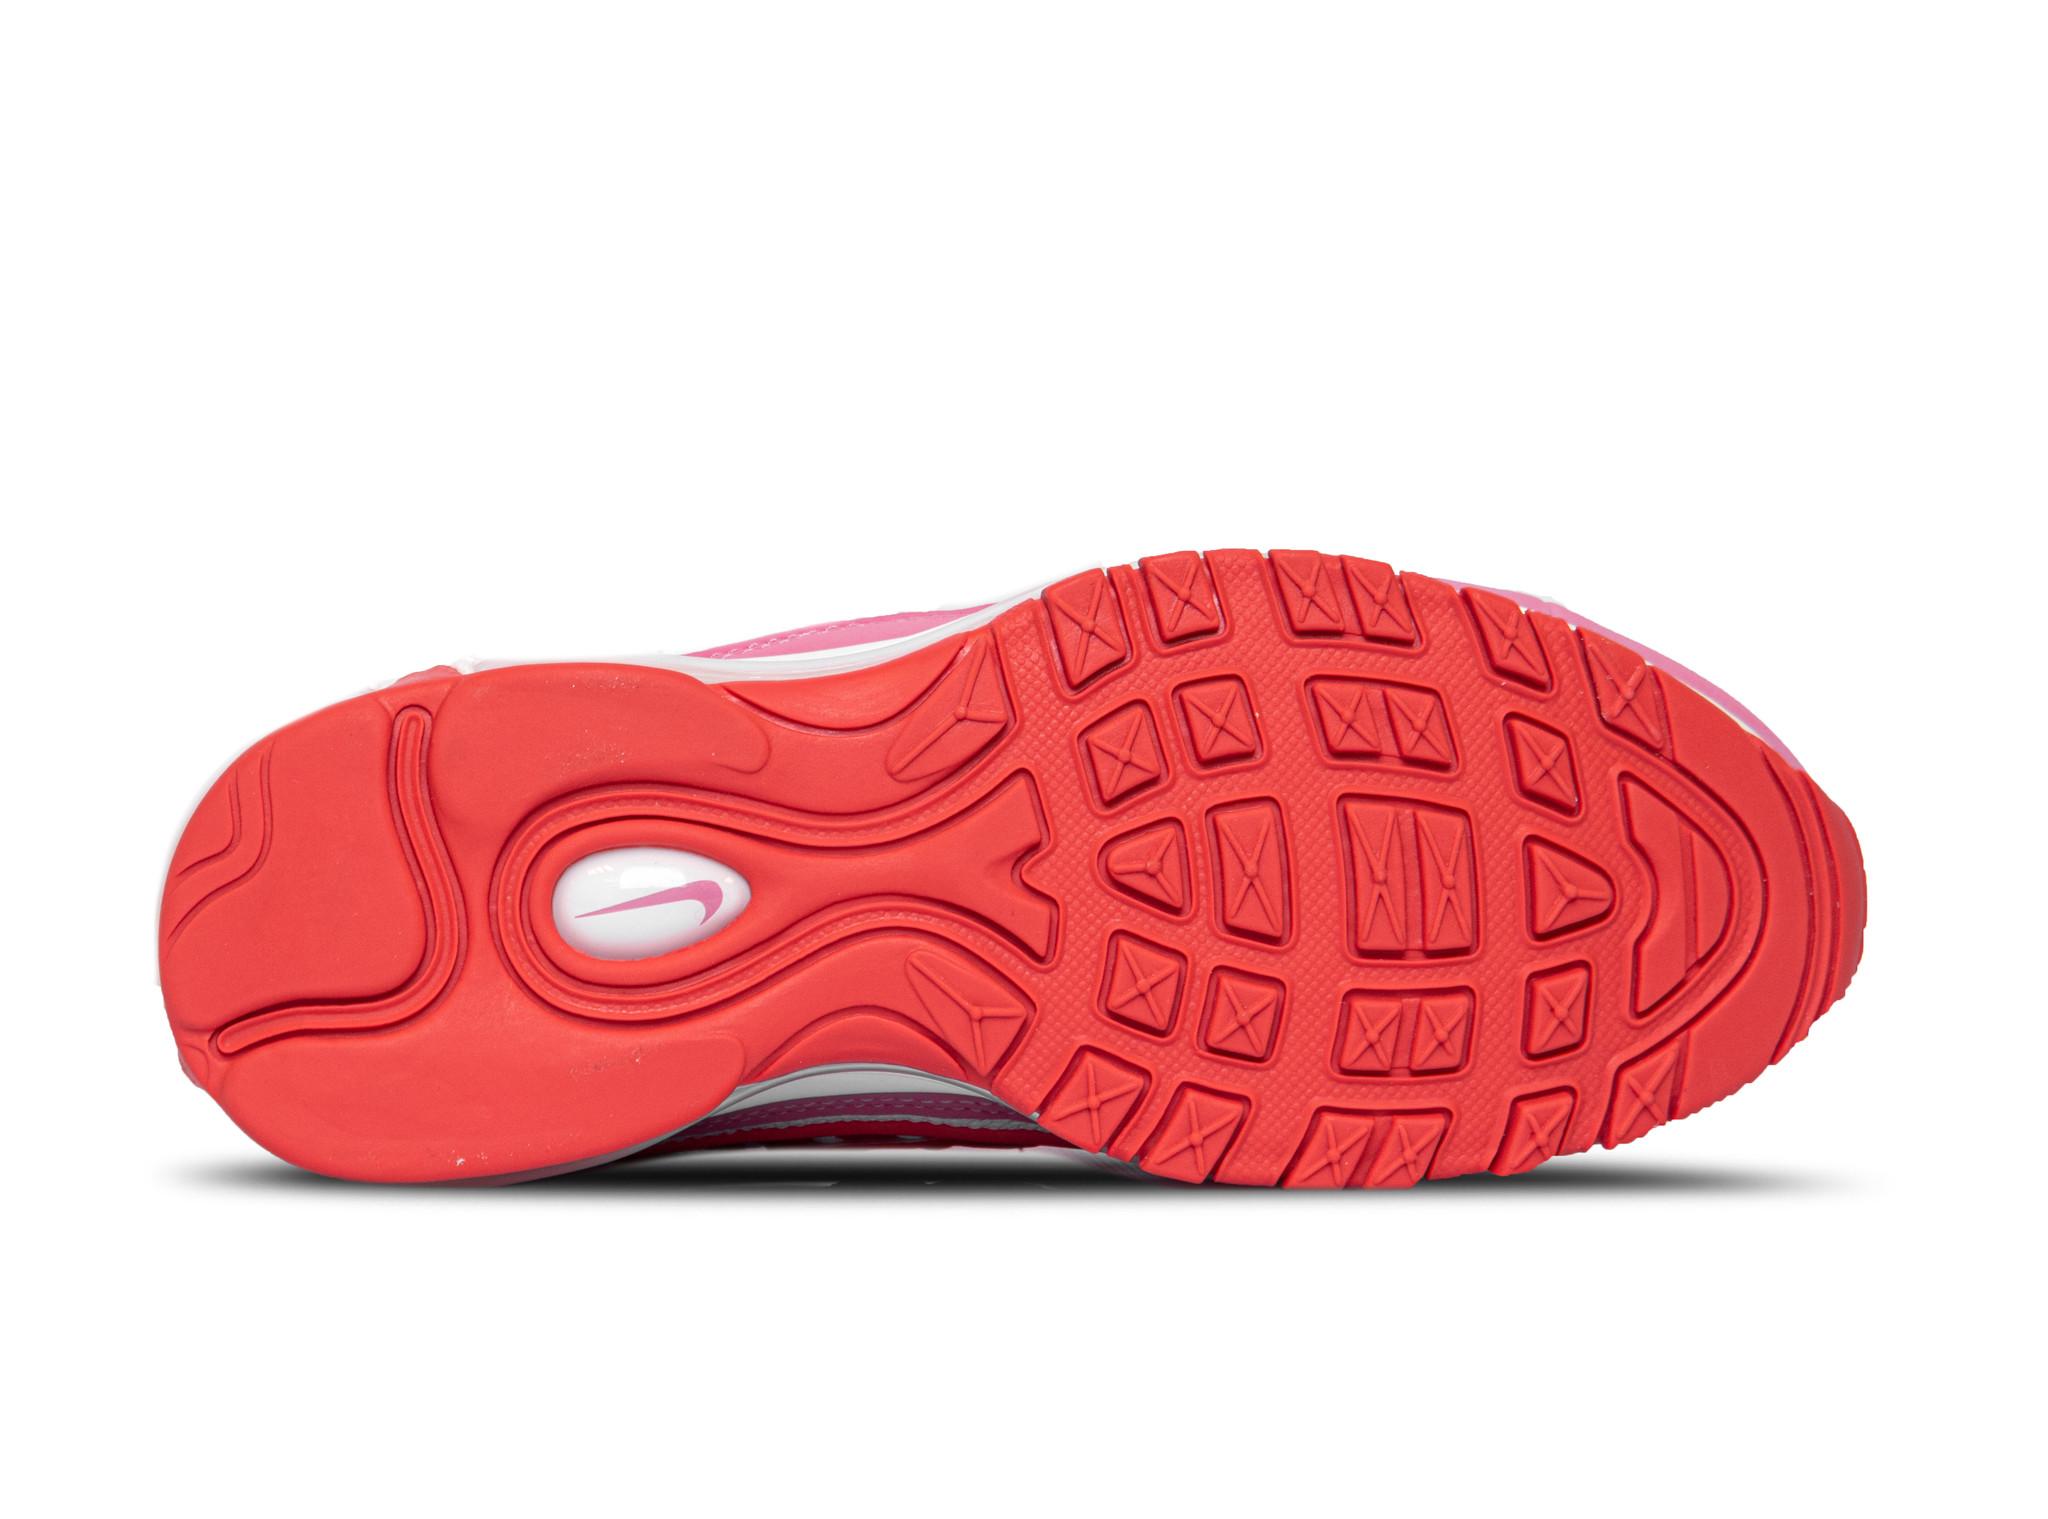 Nike Air Max 98 Track Red Magic Flamingo White CI3709 600